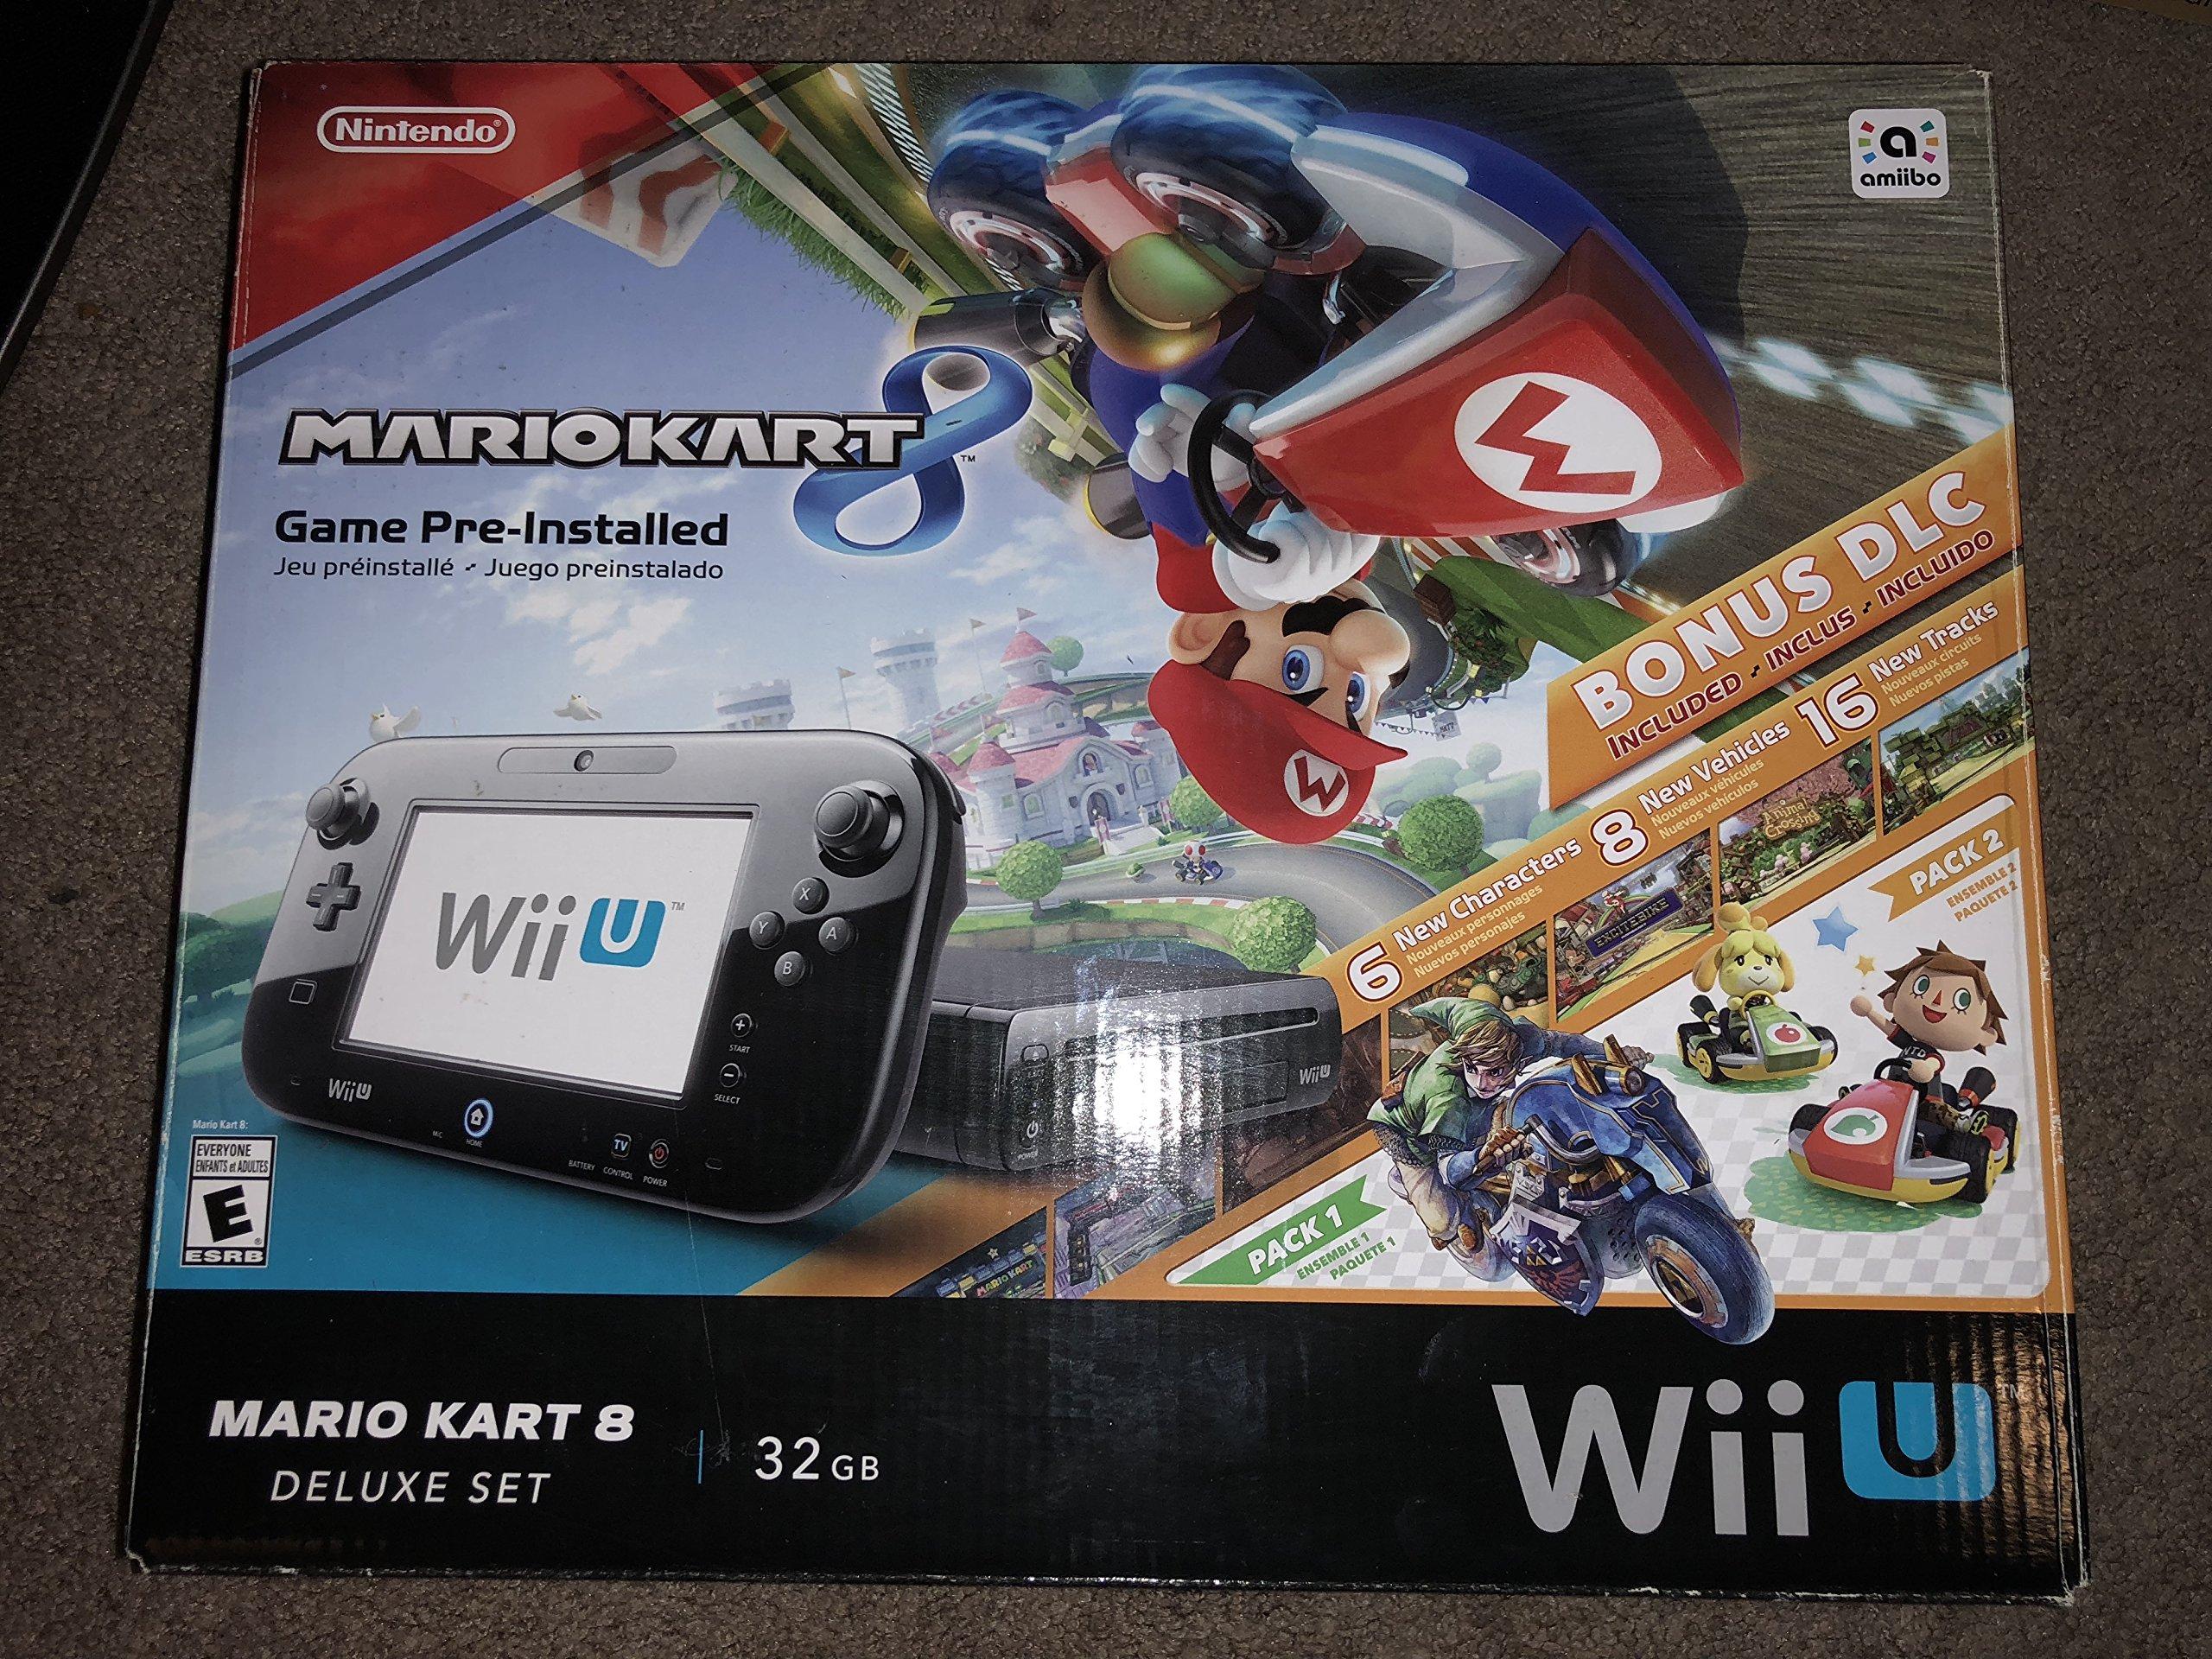 Nintendo Wii U Mario Kart 8 Deluxe Bundle (Black) by Nintendo